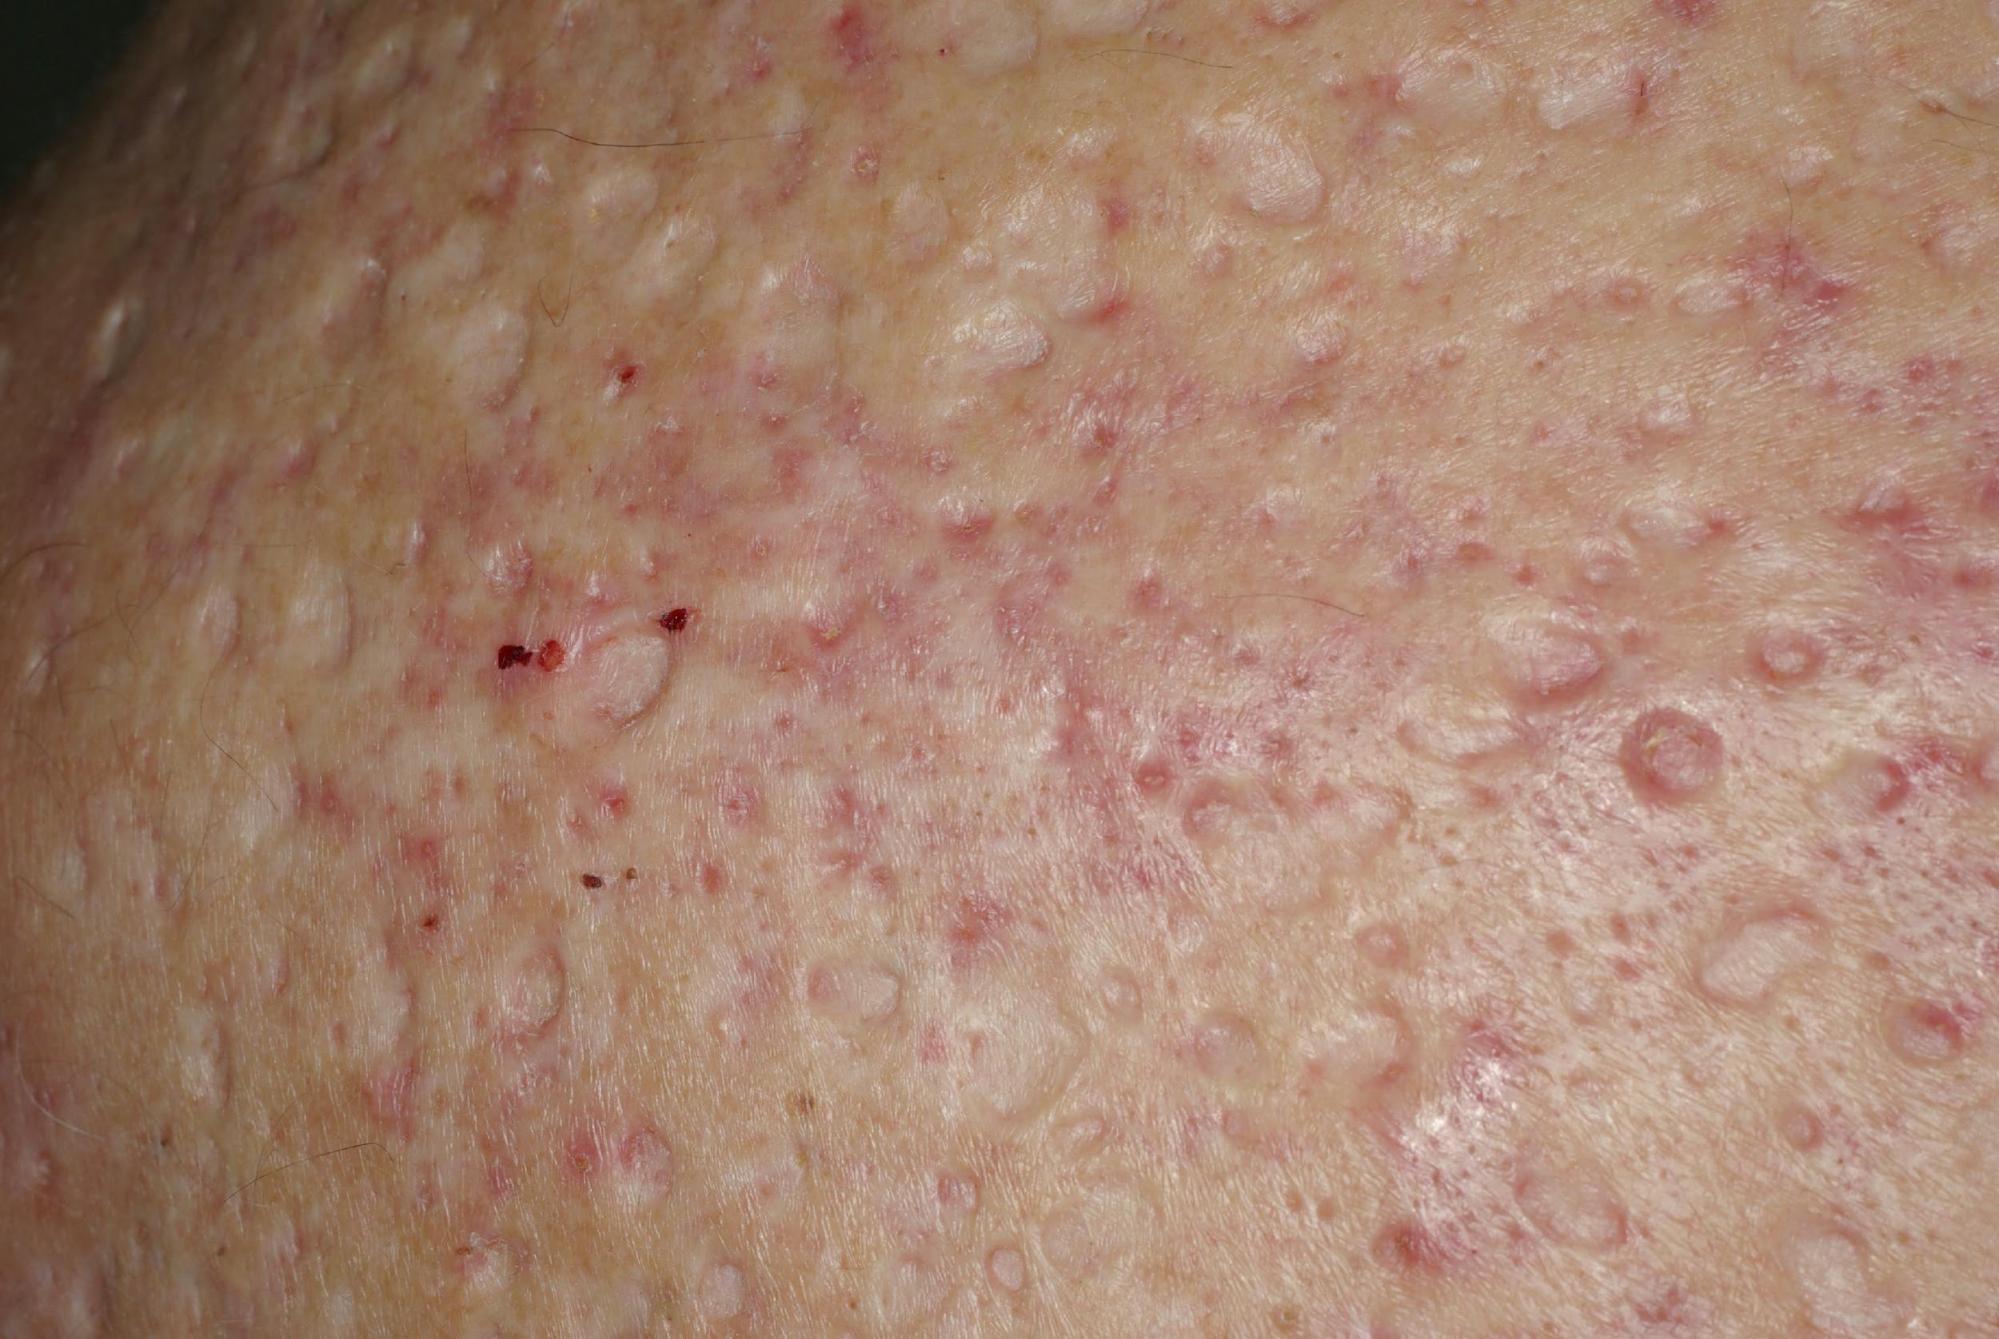 cicatrices nodulo-kystiques